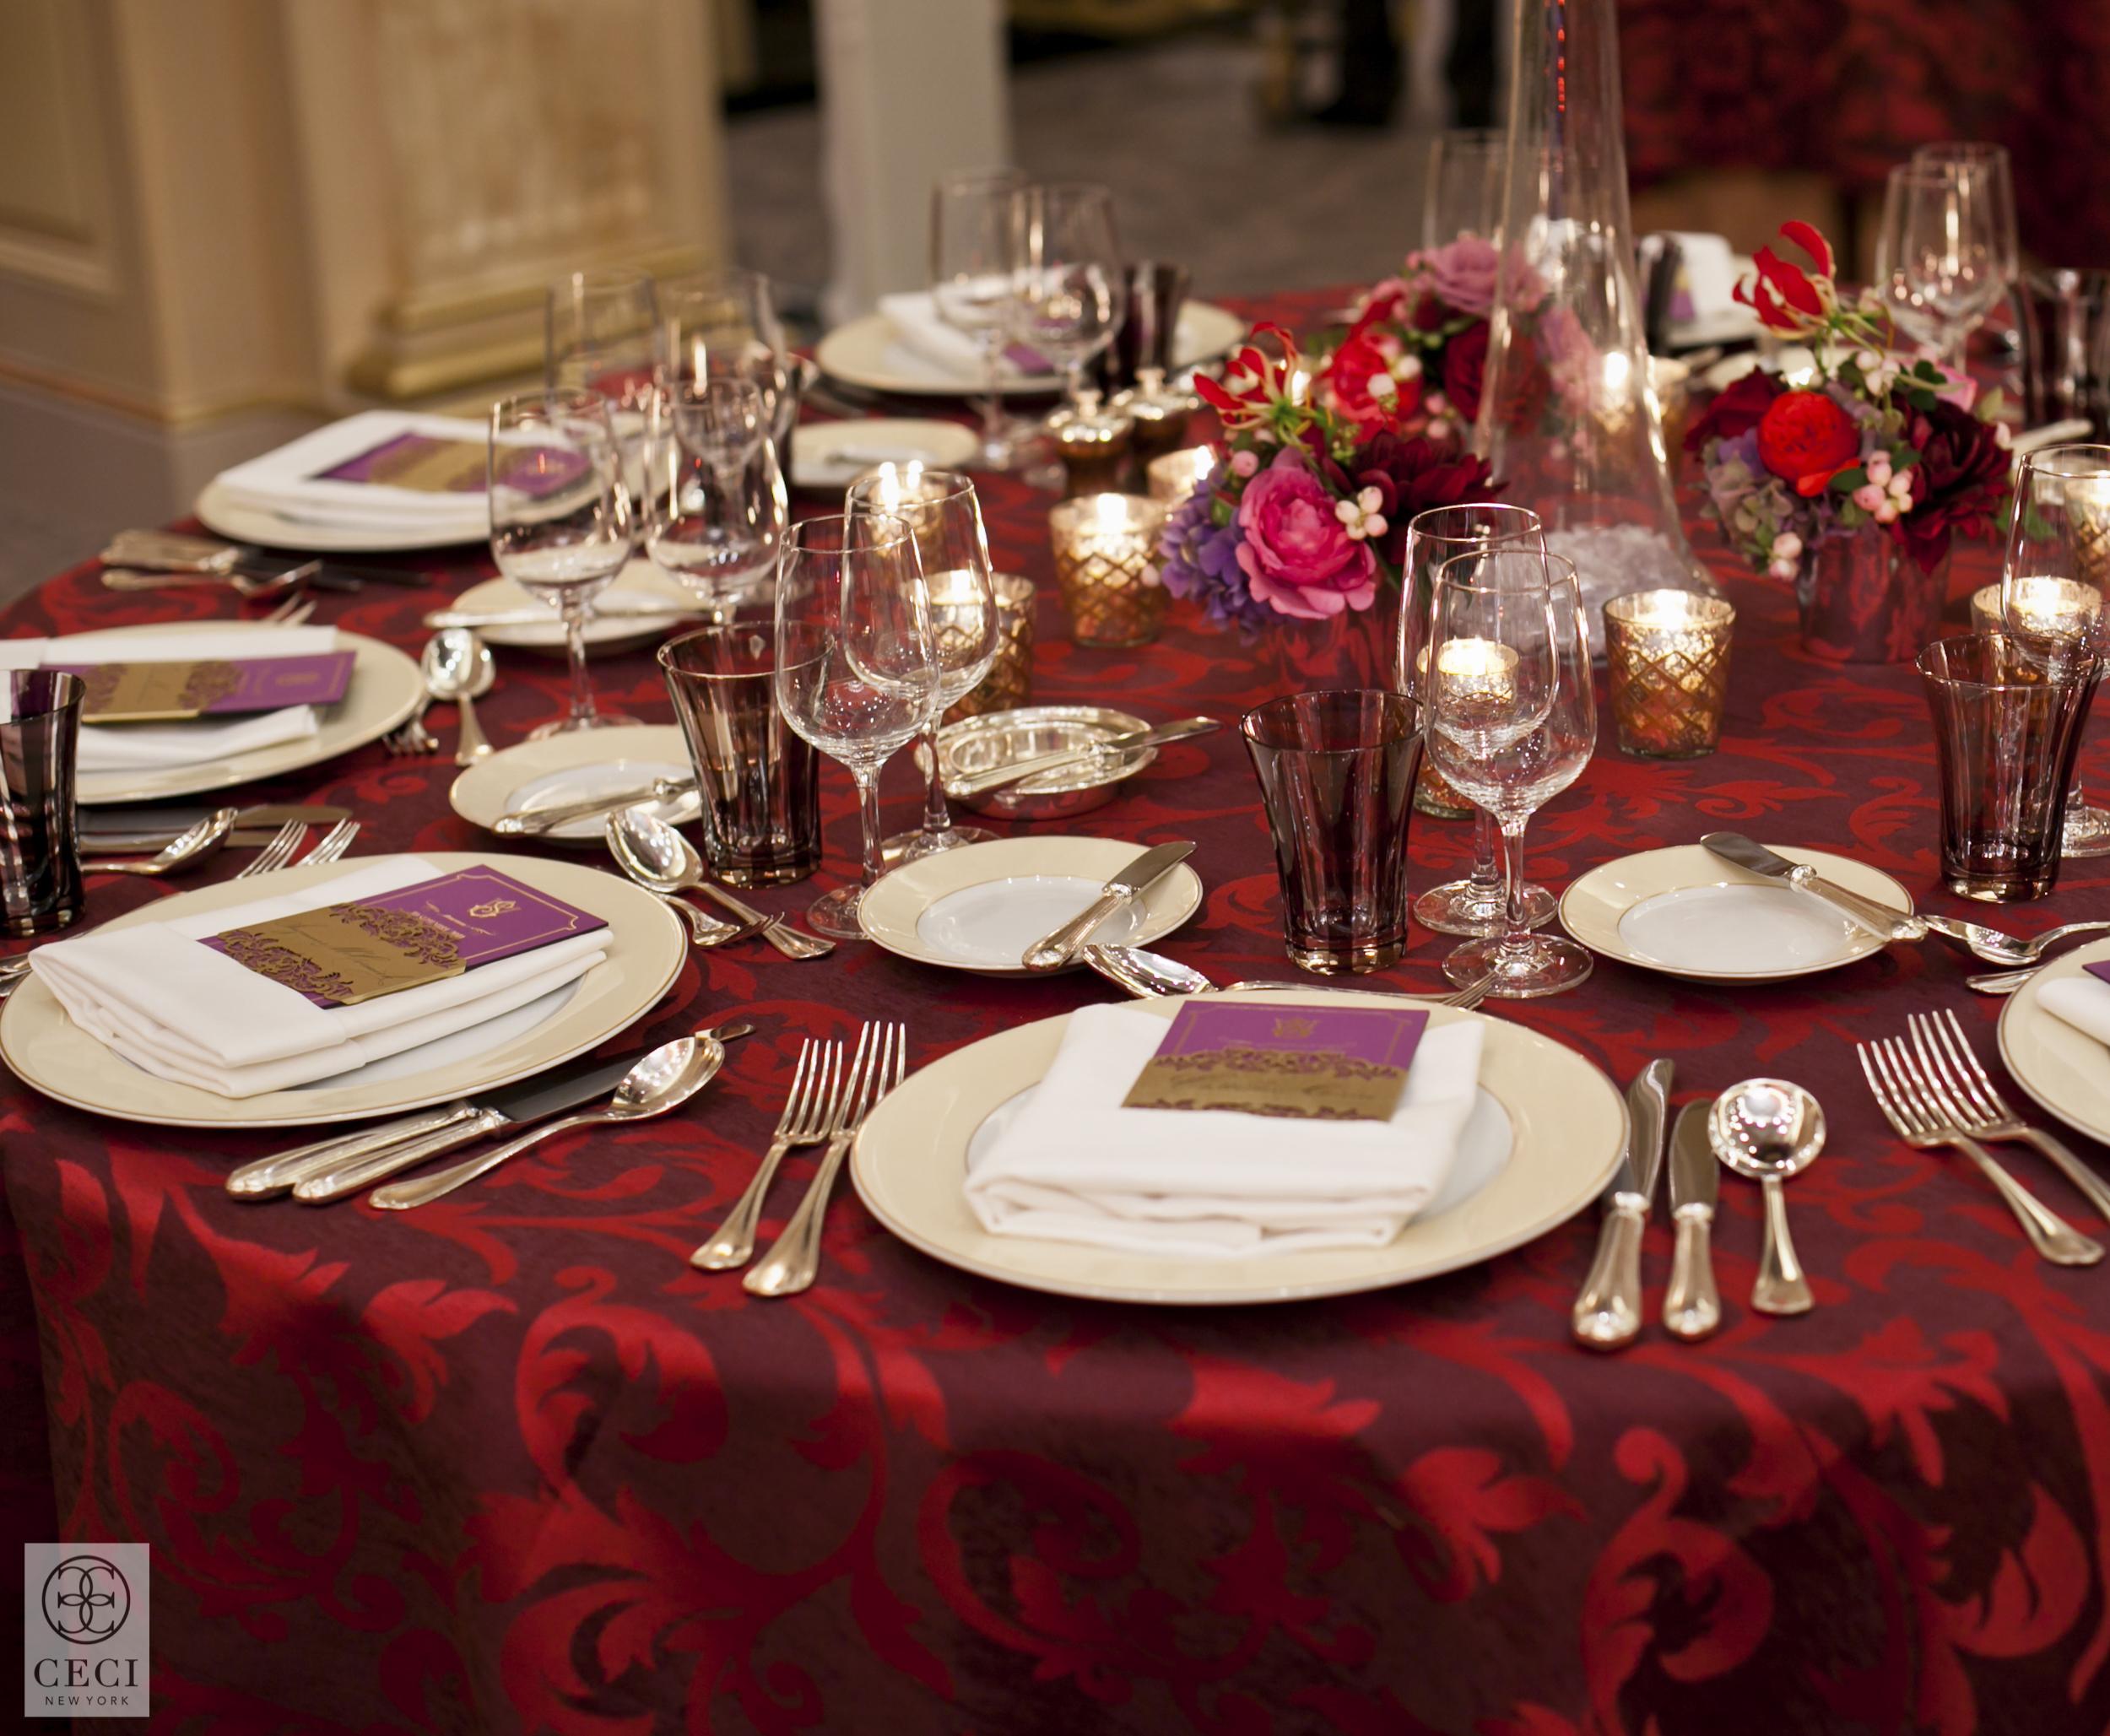 ceci_new_york_lucas_somoza_purple_regal_wediding_birthday_commitment_ceremony_gold-46.jpg